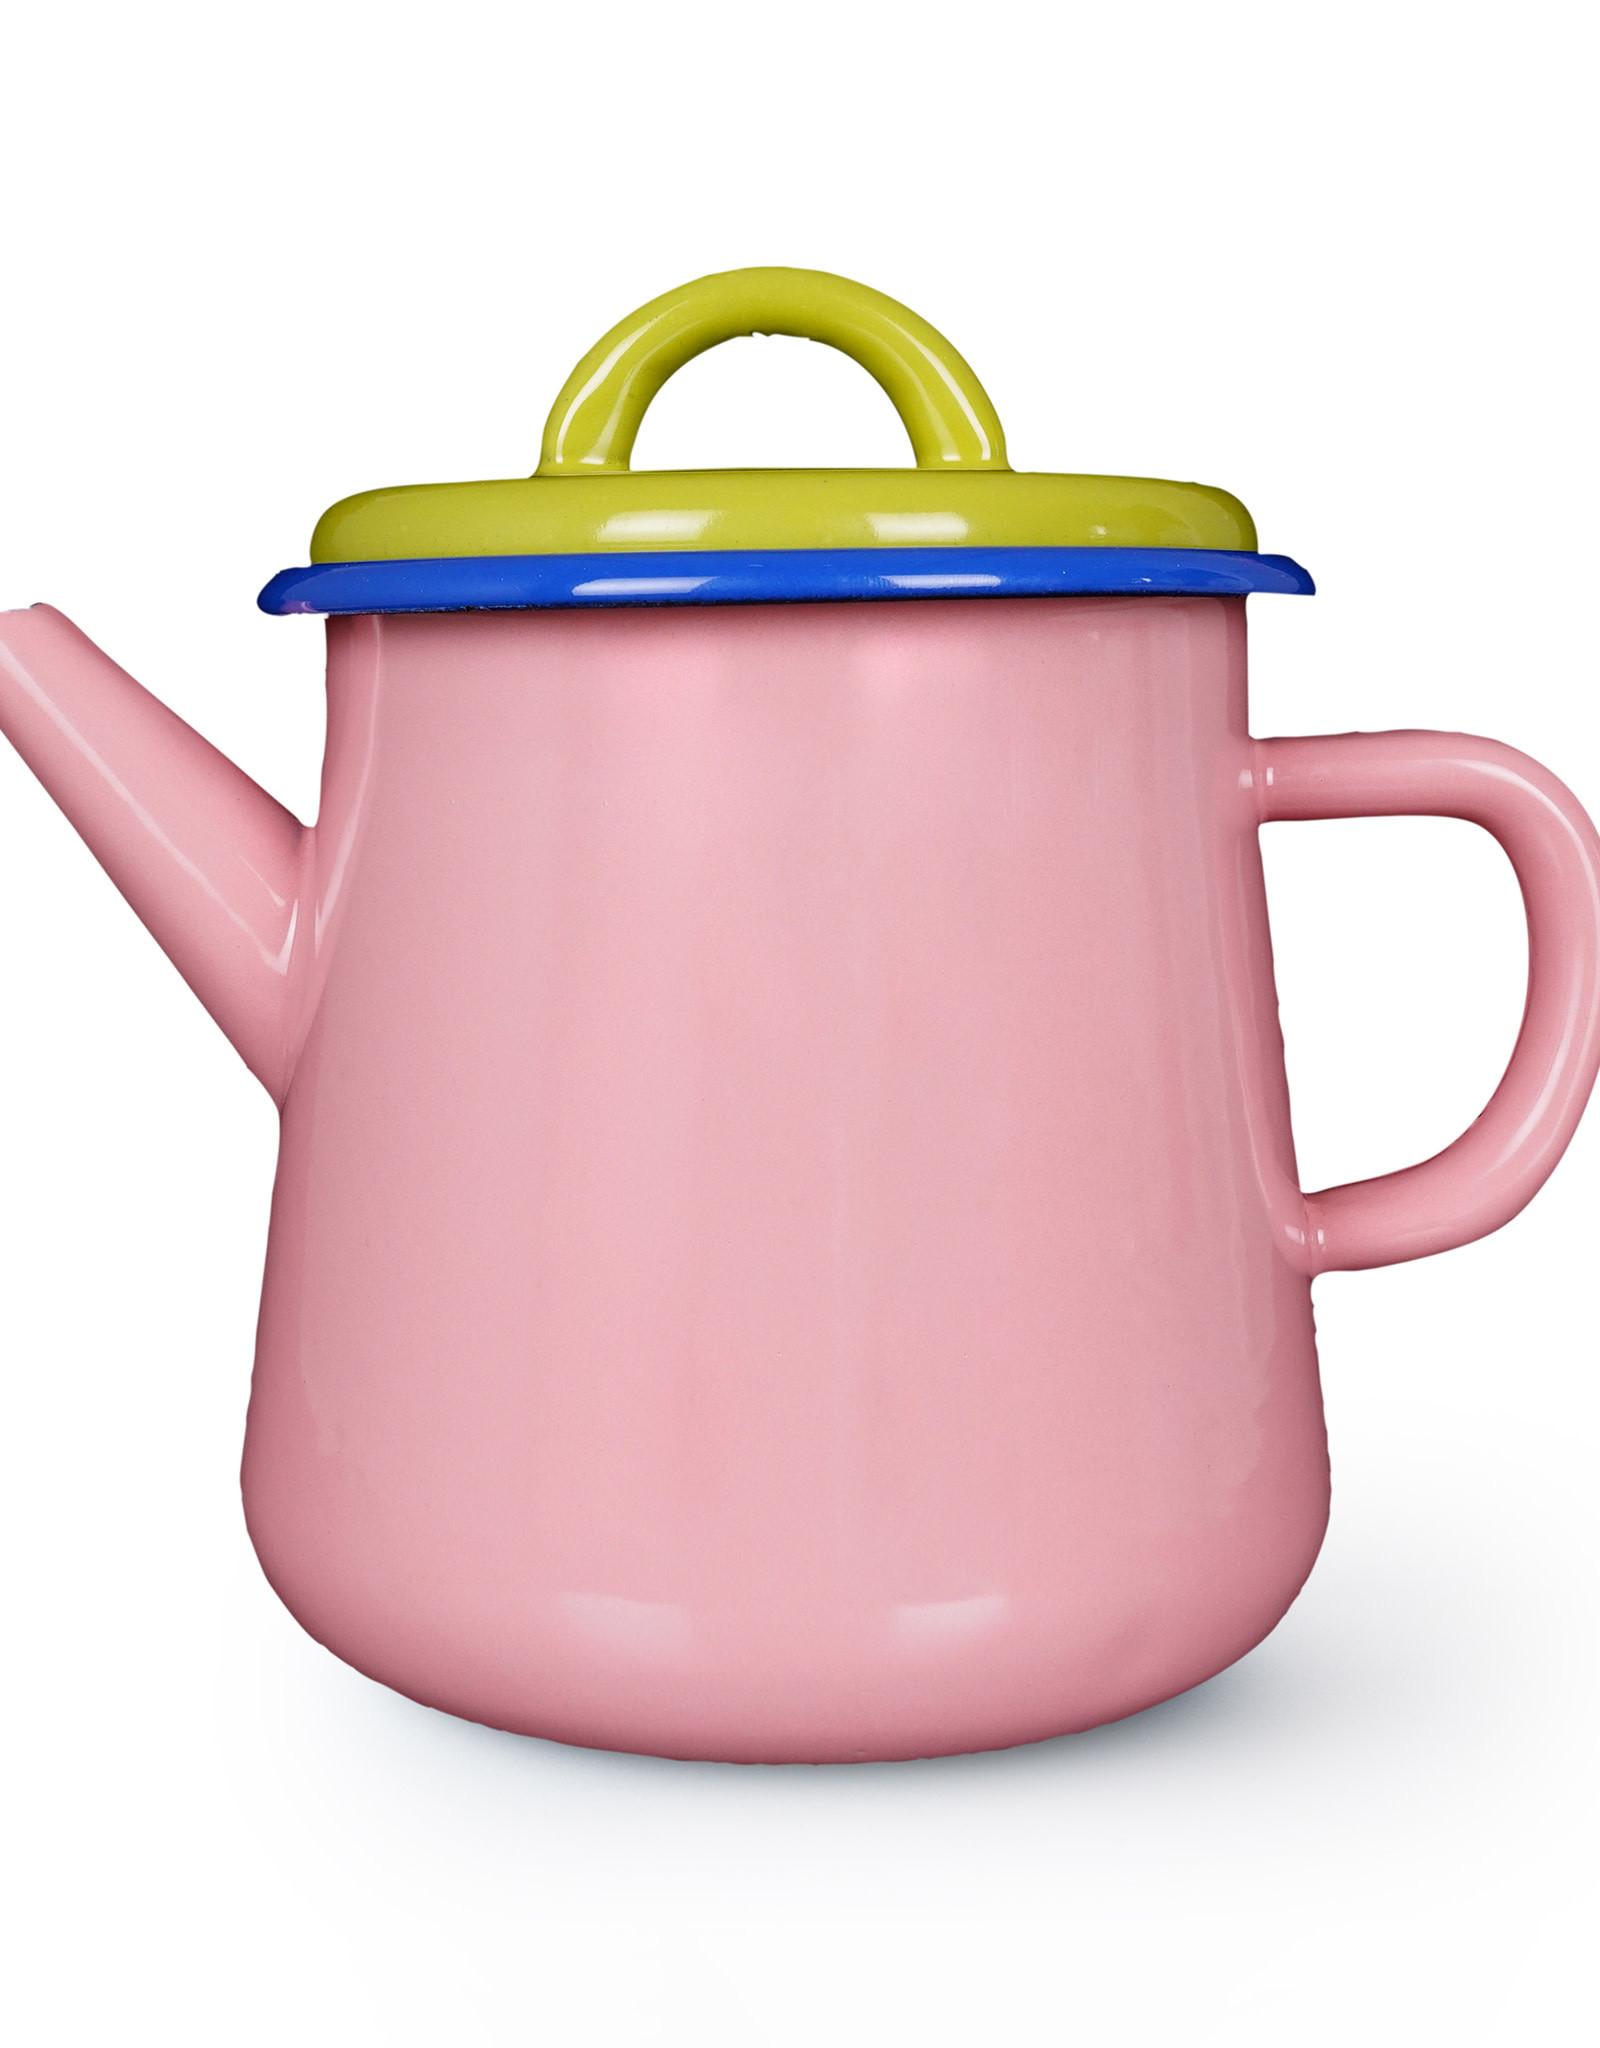 Bornn Colorama 30 oz Teapot